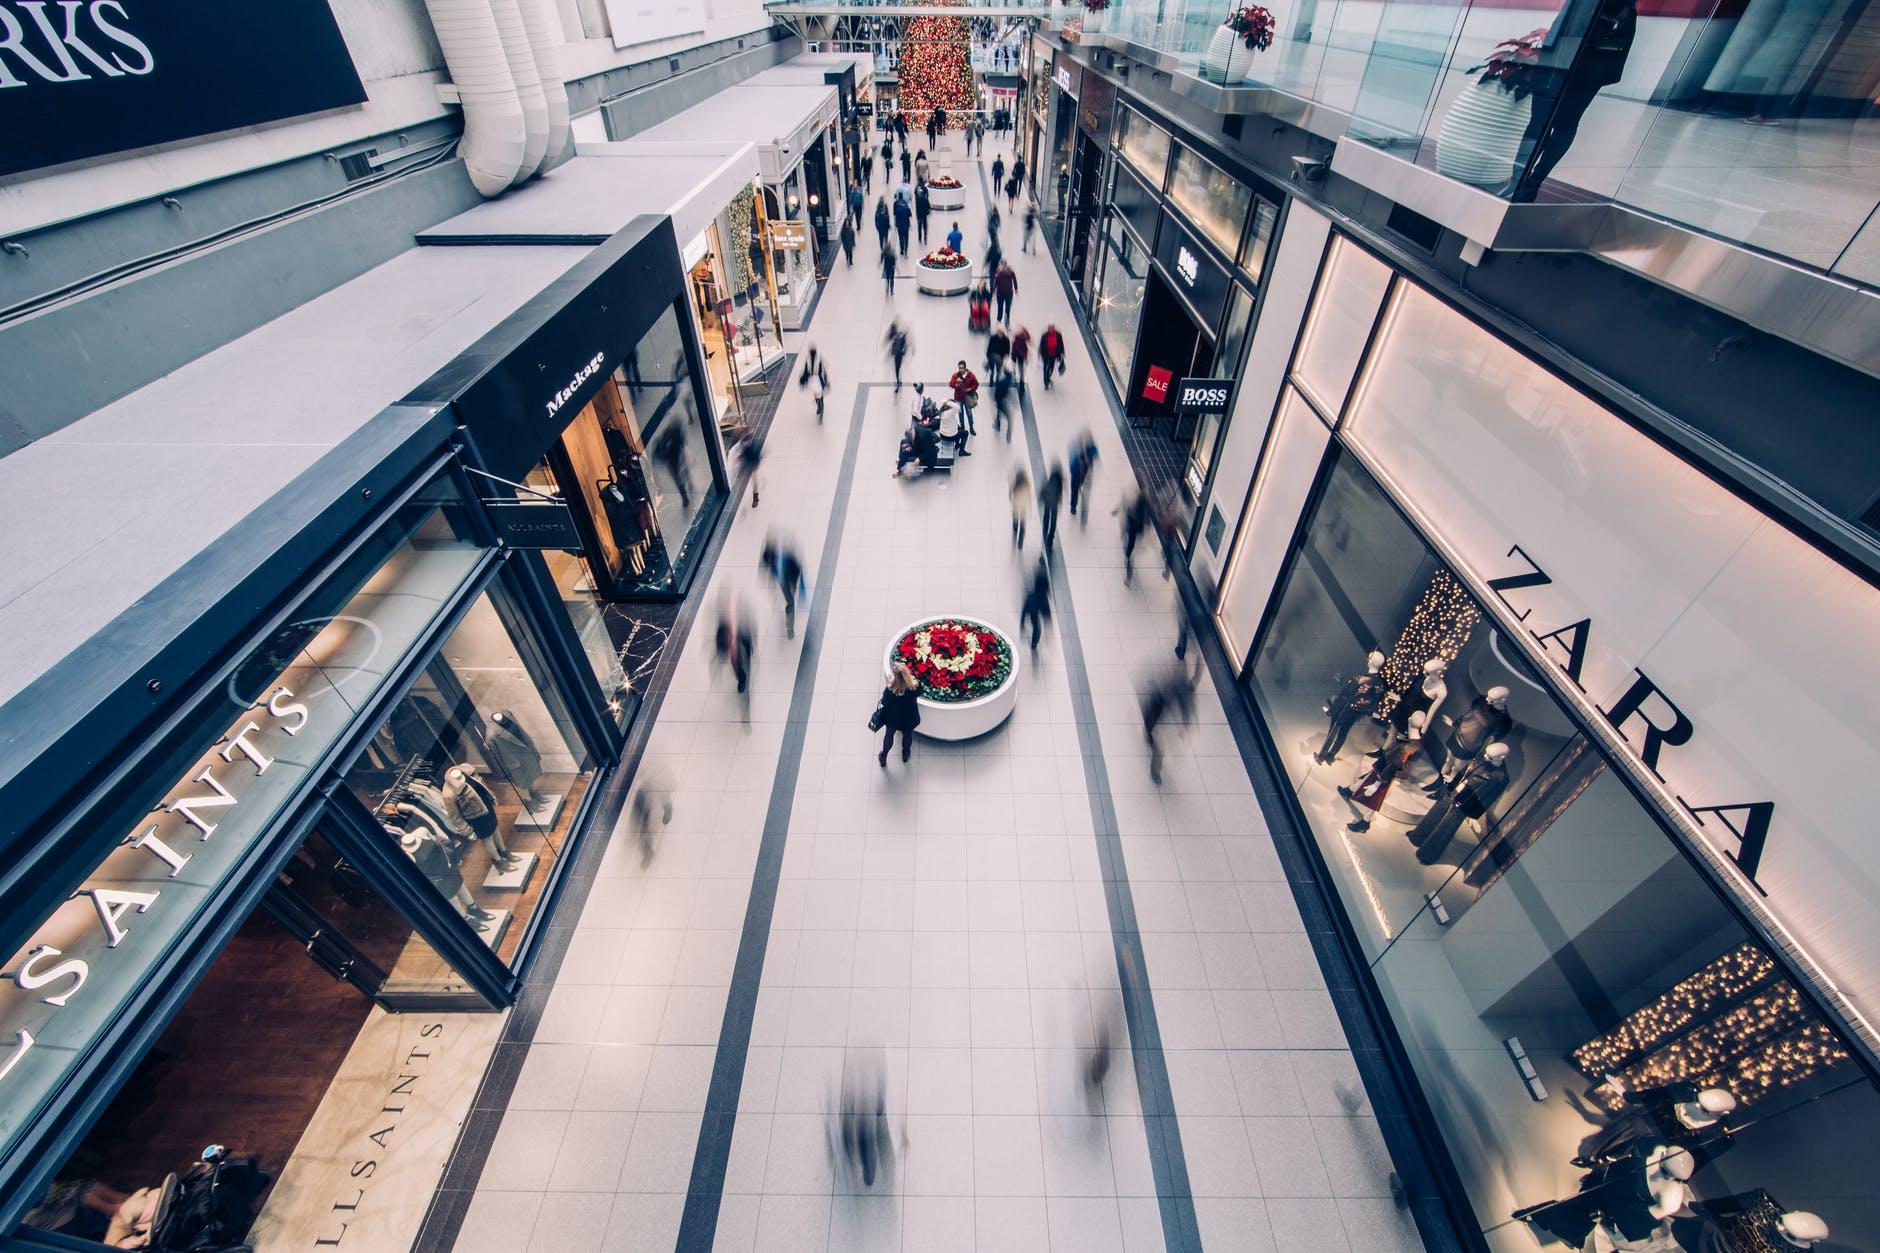 Suburban Retail S-REITs have Smoothest Suburban Retail S-REITs Have Smoothest Recovery Path: Credit Suisse